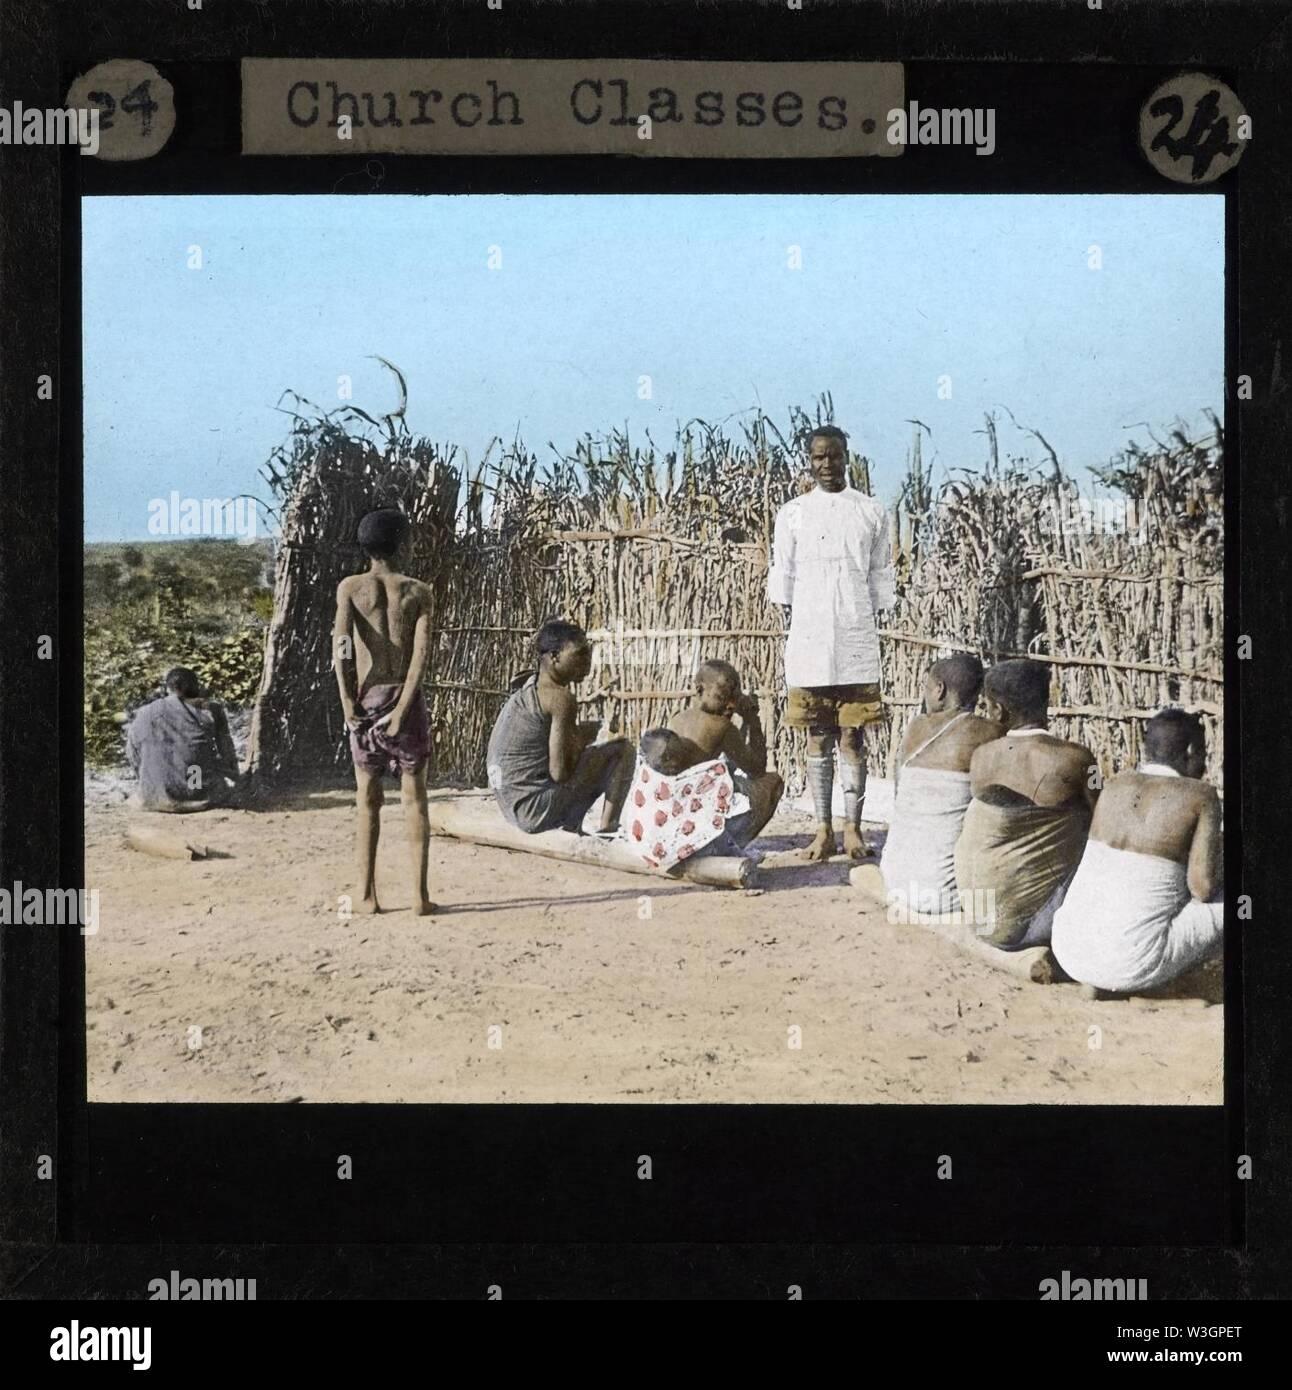 Church Classes, Lubwa, Zambia, ca.1905-ca.1940 (imp-cswc-GB-237-CSWC47-LS6-024). - Stock Image